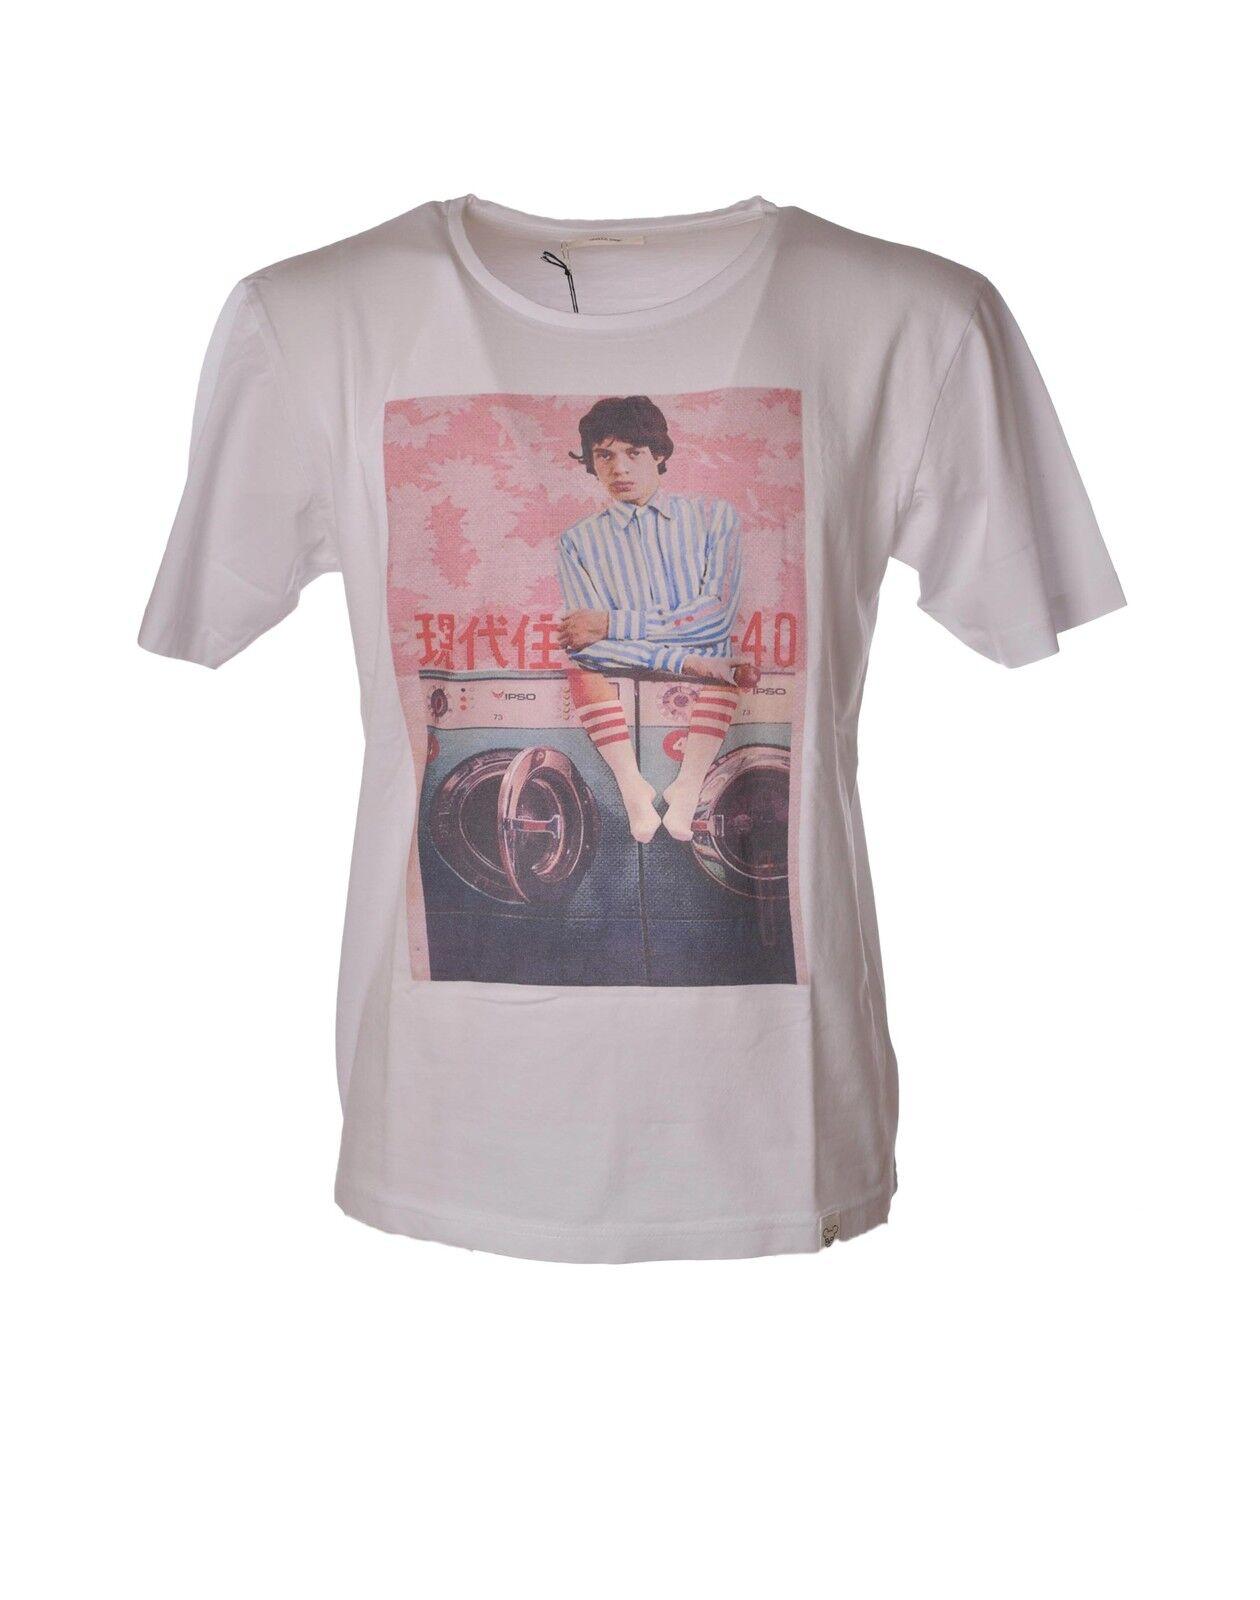 Obvious Basic - Topwear-T-shirts - Mann - white - 3815915G181557